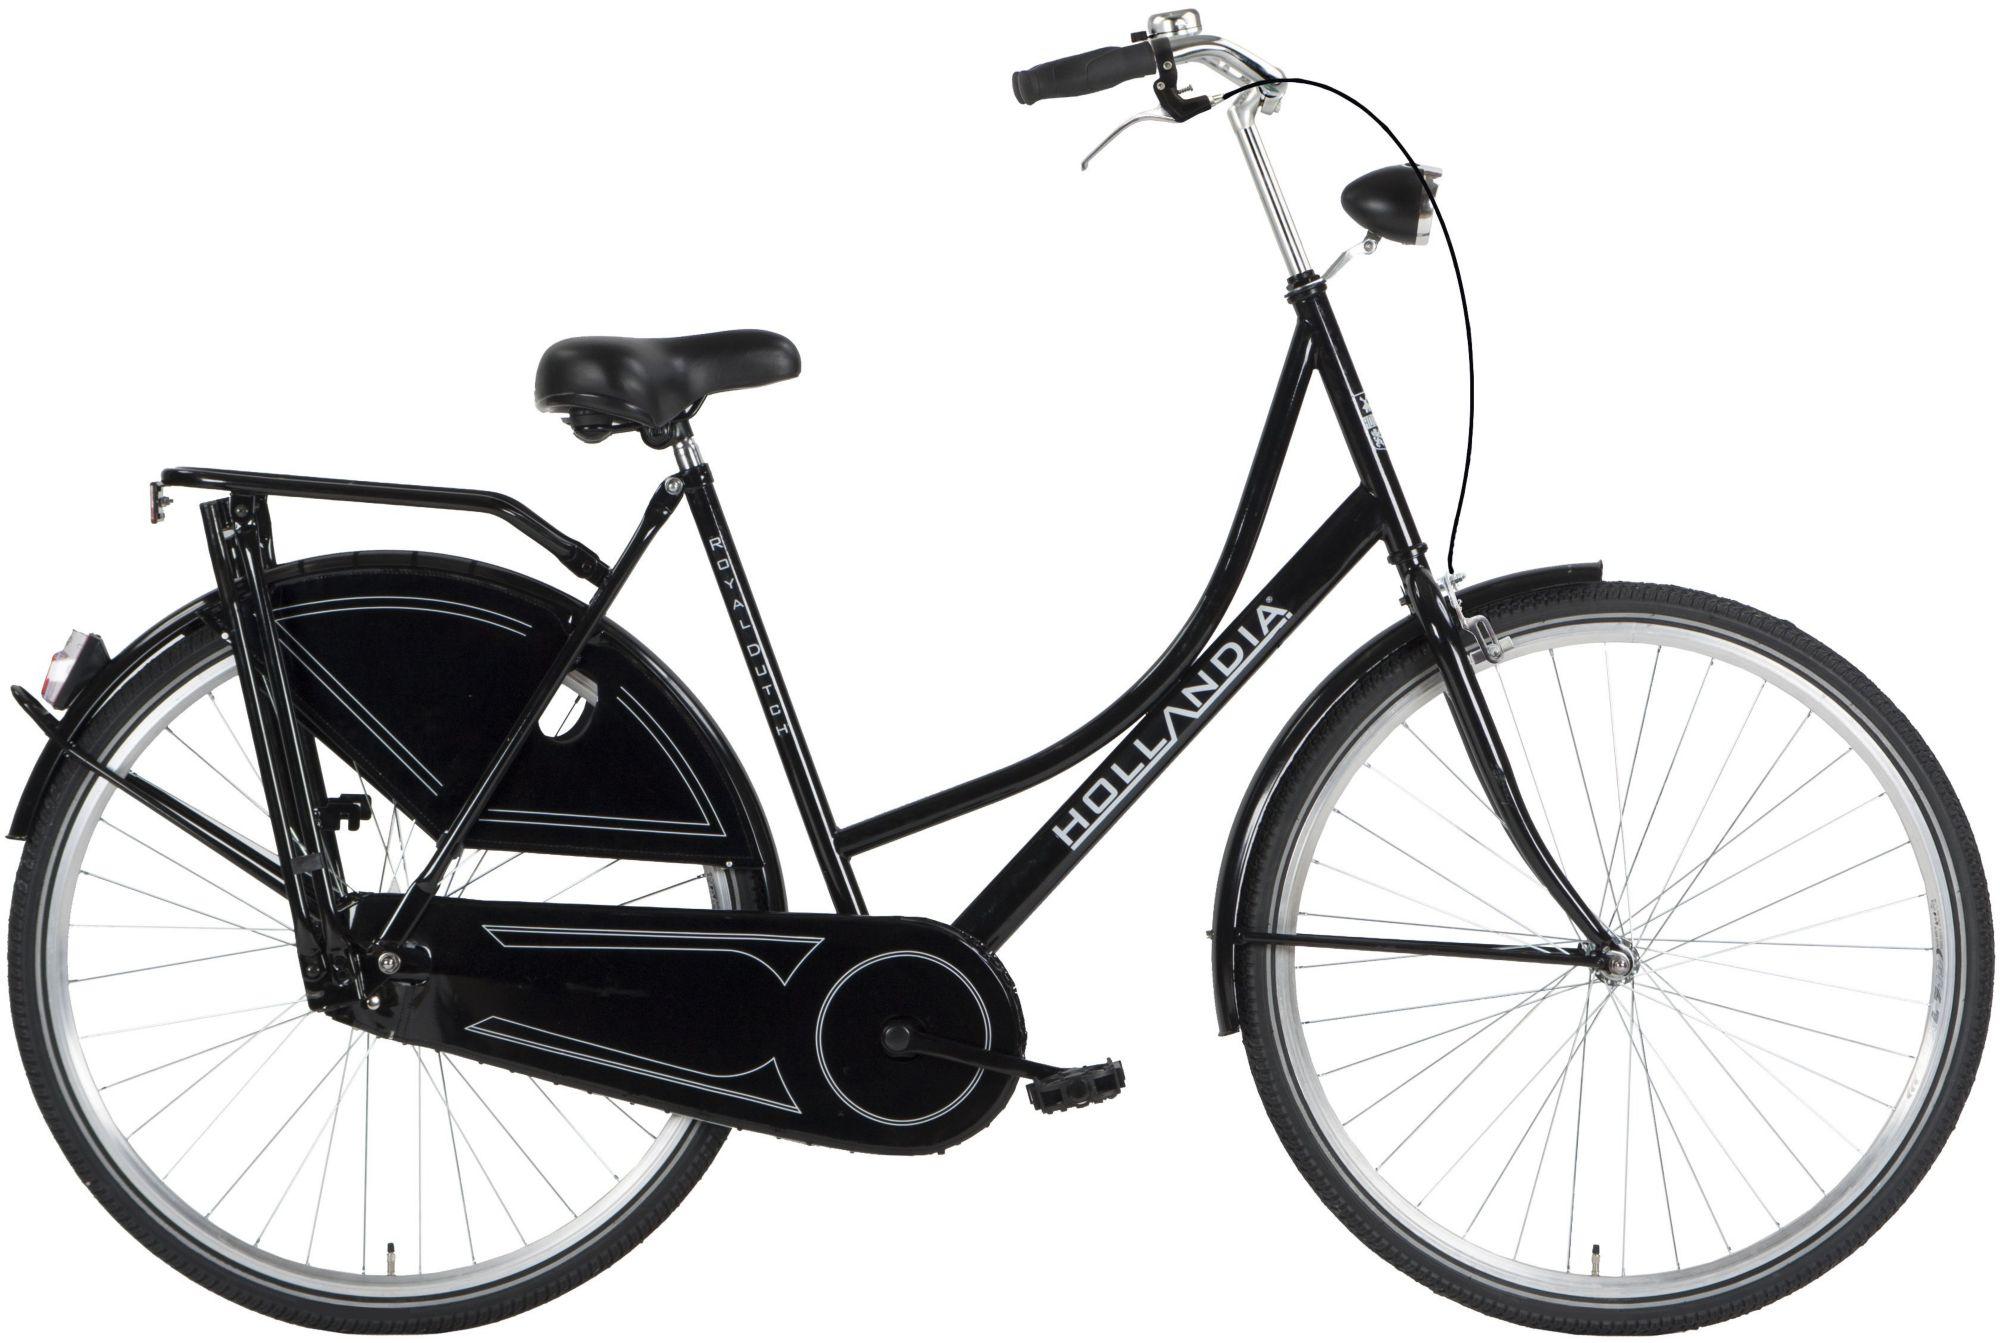 HOLLANDIA Hollandia Damen Citybike, 28 Zoll, Singlespeed, Rücktritt, »Grandma«